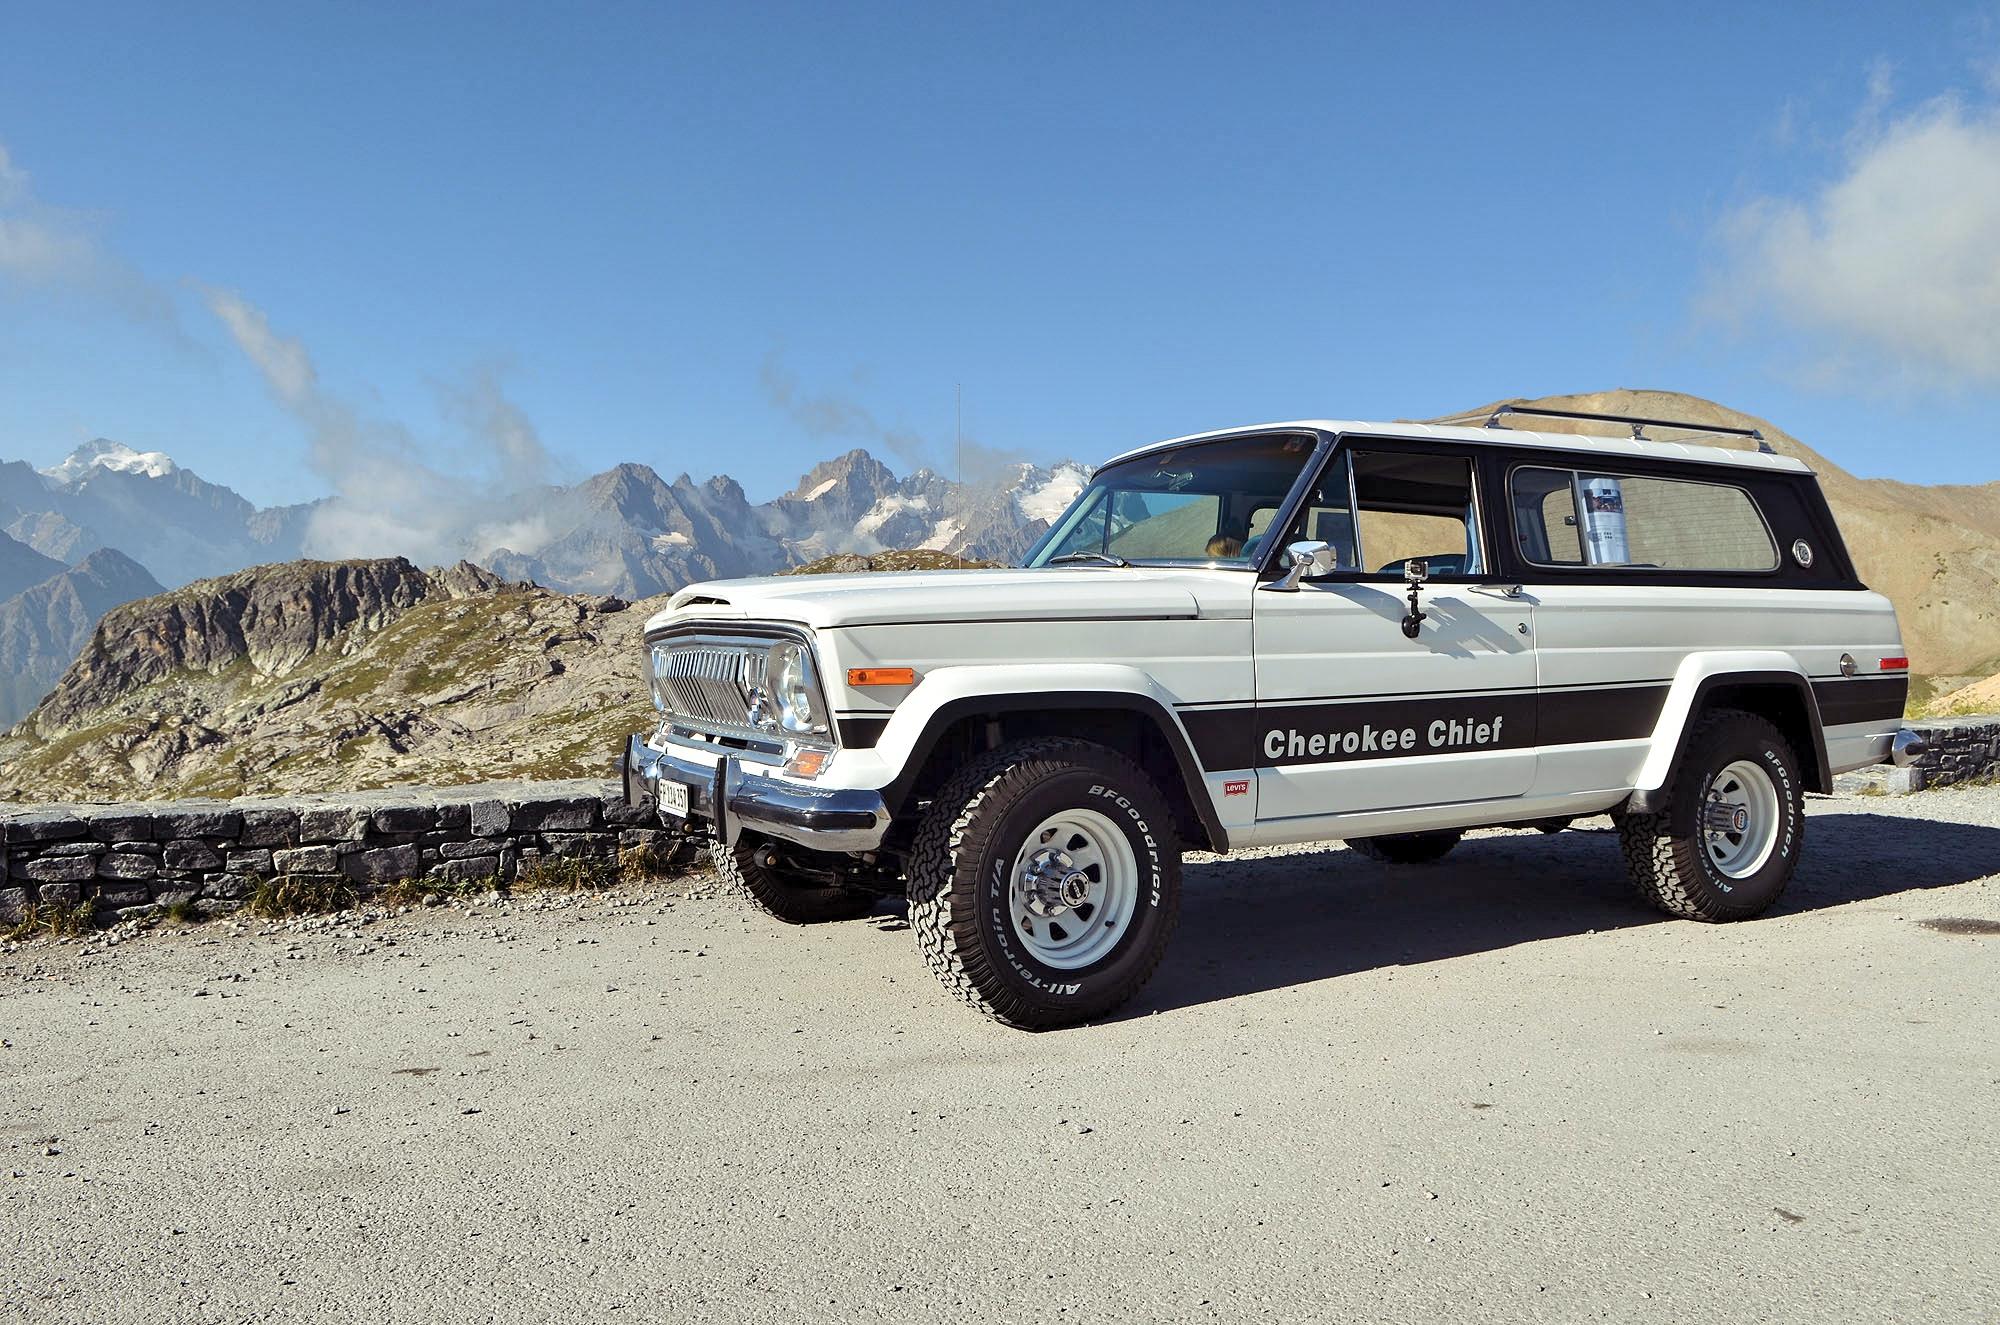 jeep-cherokee-chief-valloire-106.JPG